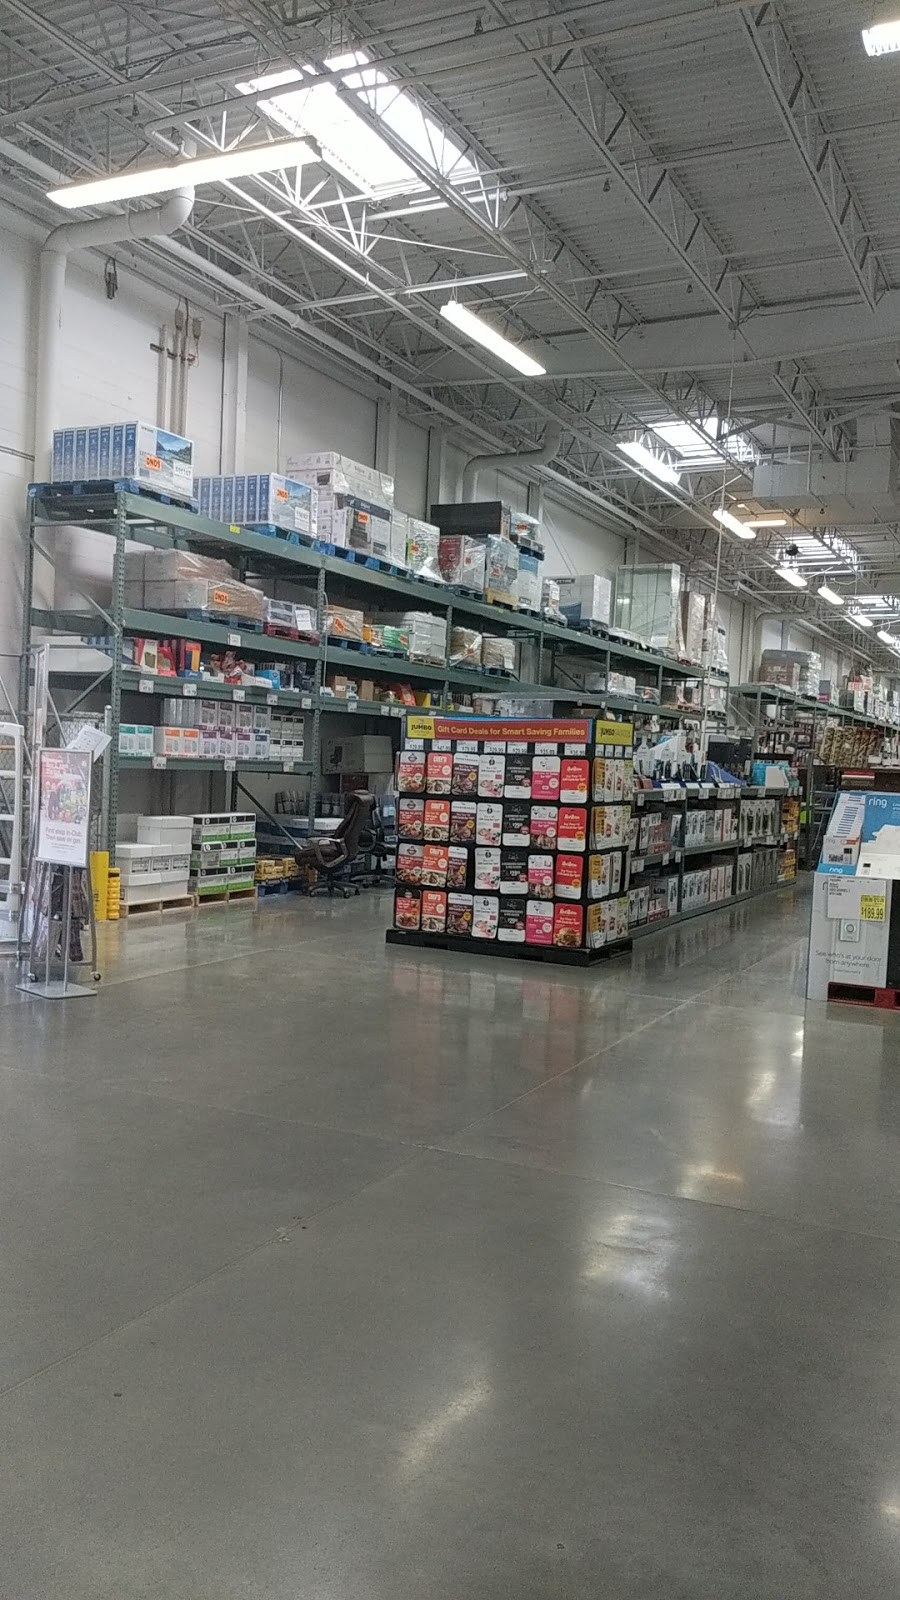 BJs Wholesale Club - gas station  | Photo 2 of 10 | Address: 8811 Brier Creek Pkwy, Raleigh, NC 27617, USA | Phone: (919) 806-5000